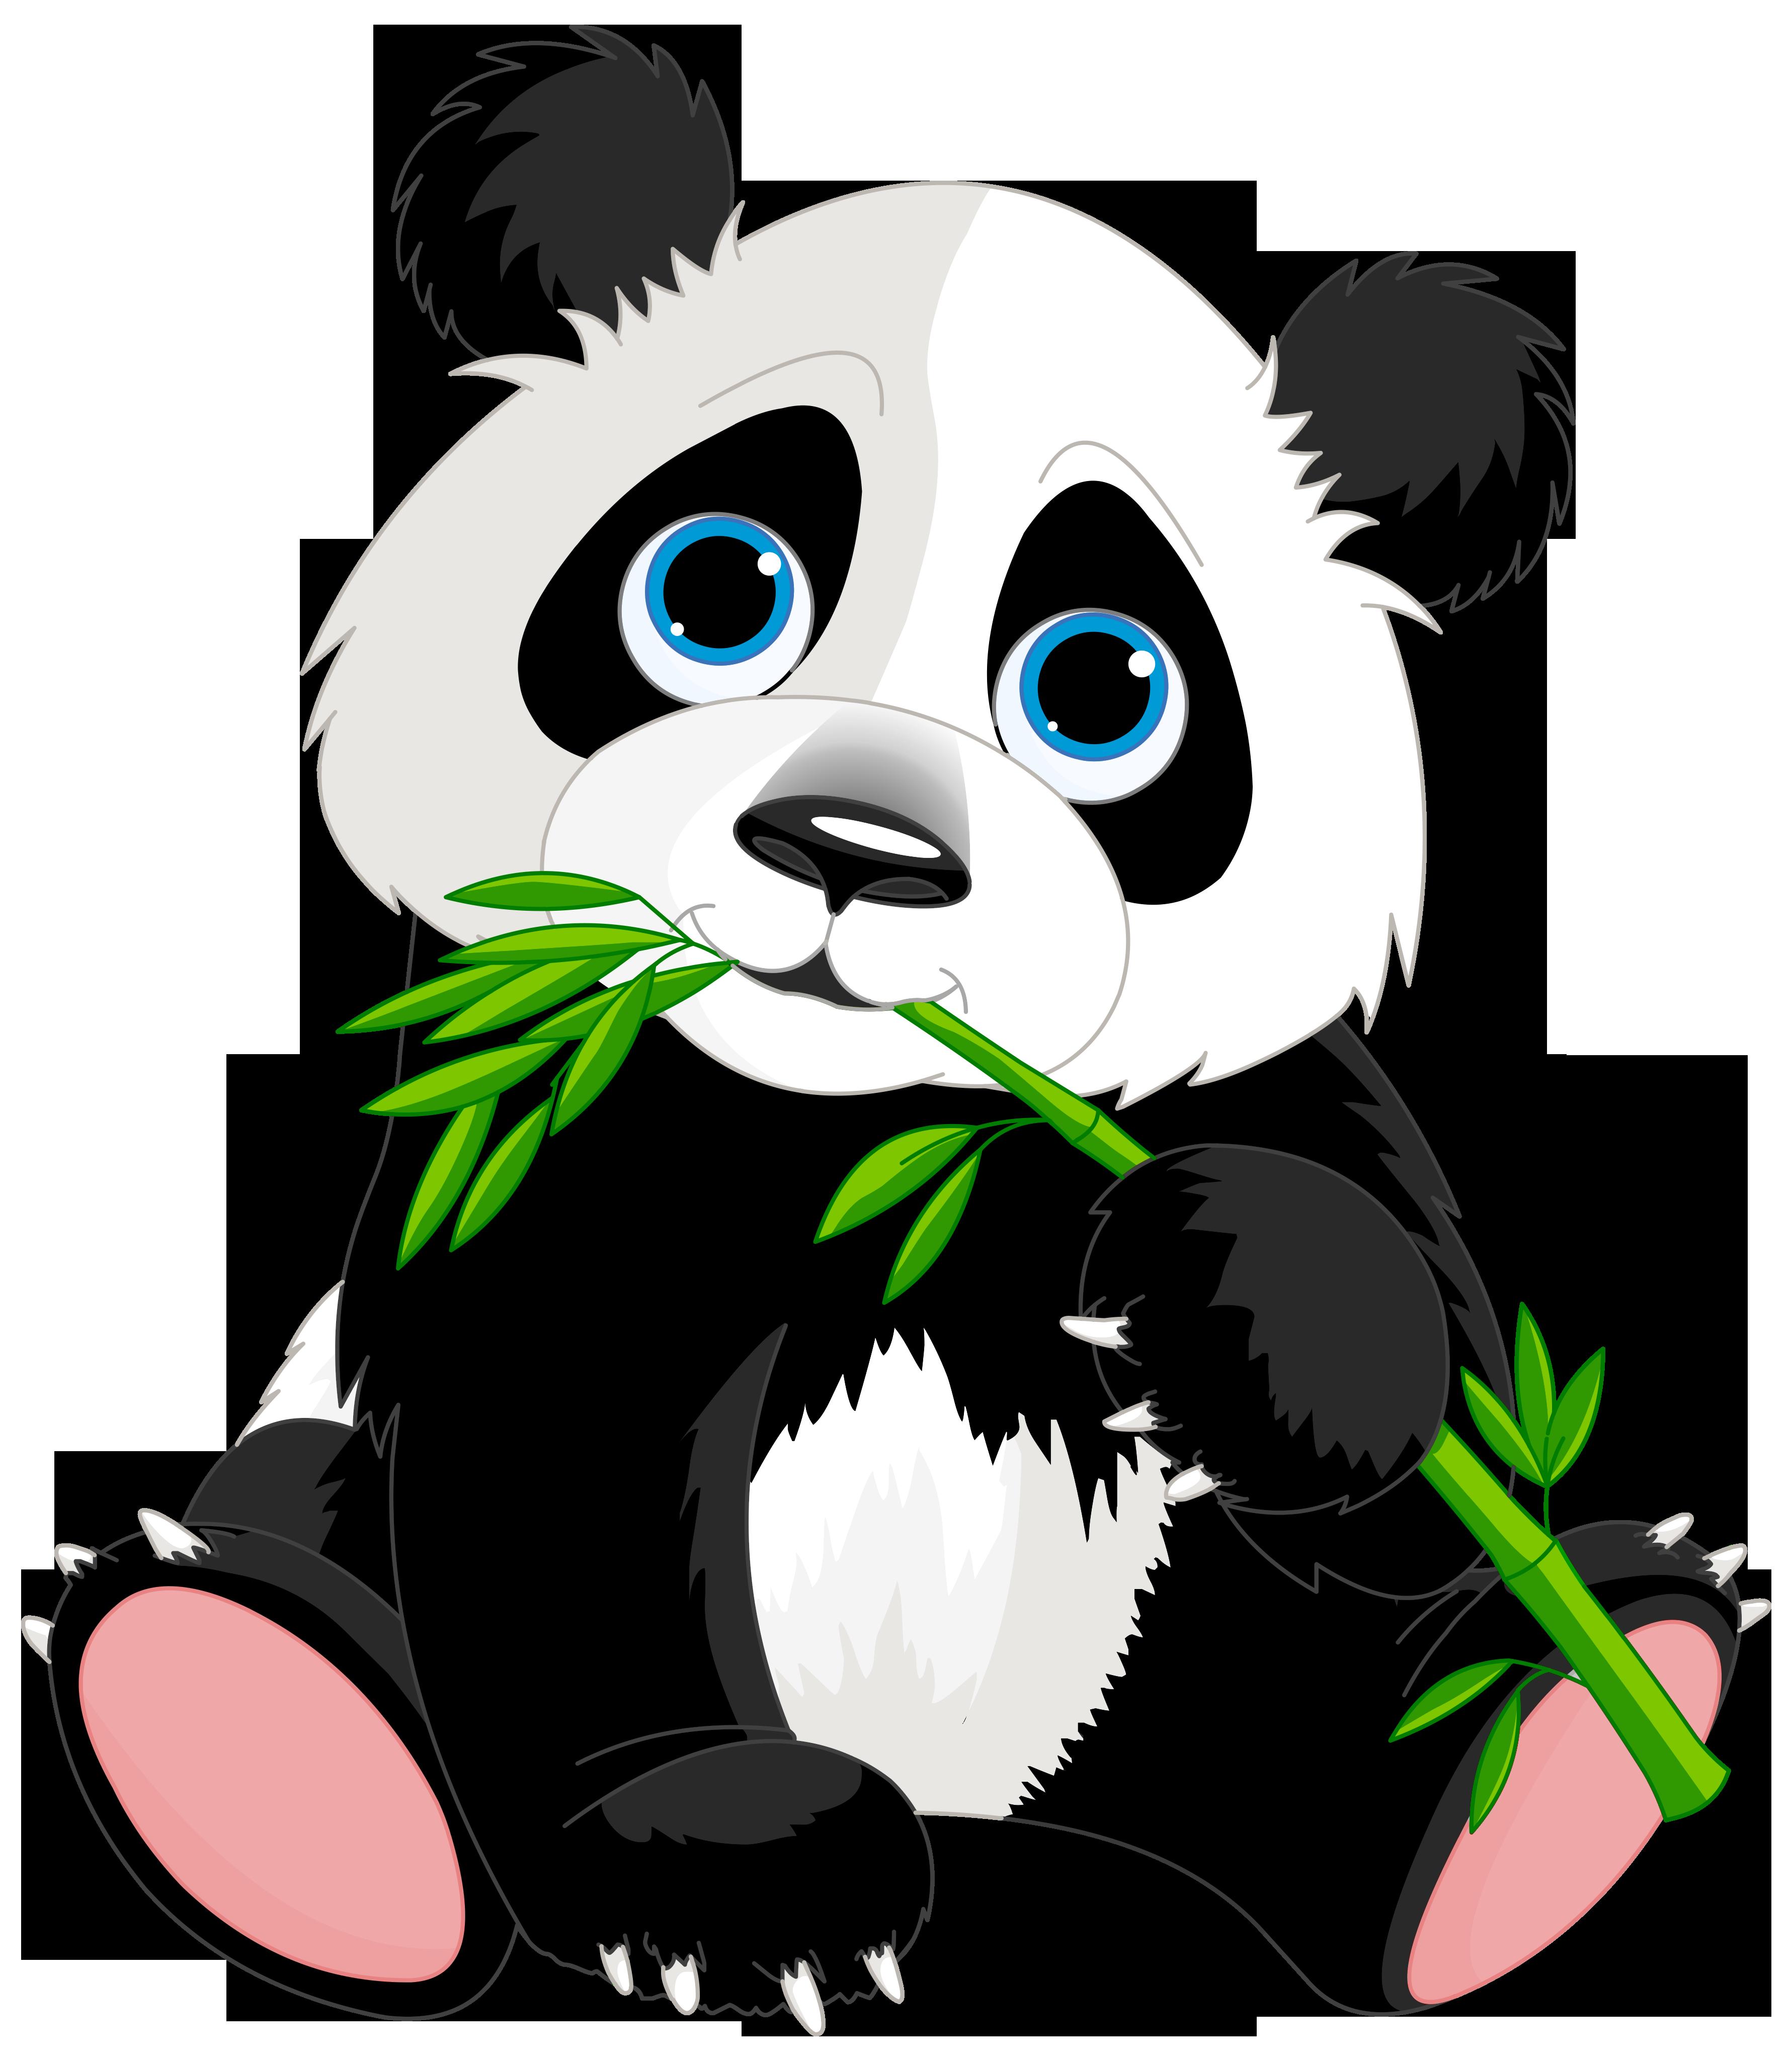 3562x4094 Panda Clip Art Black And White